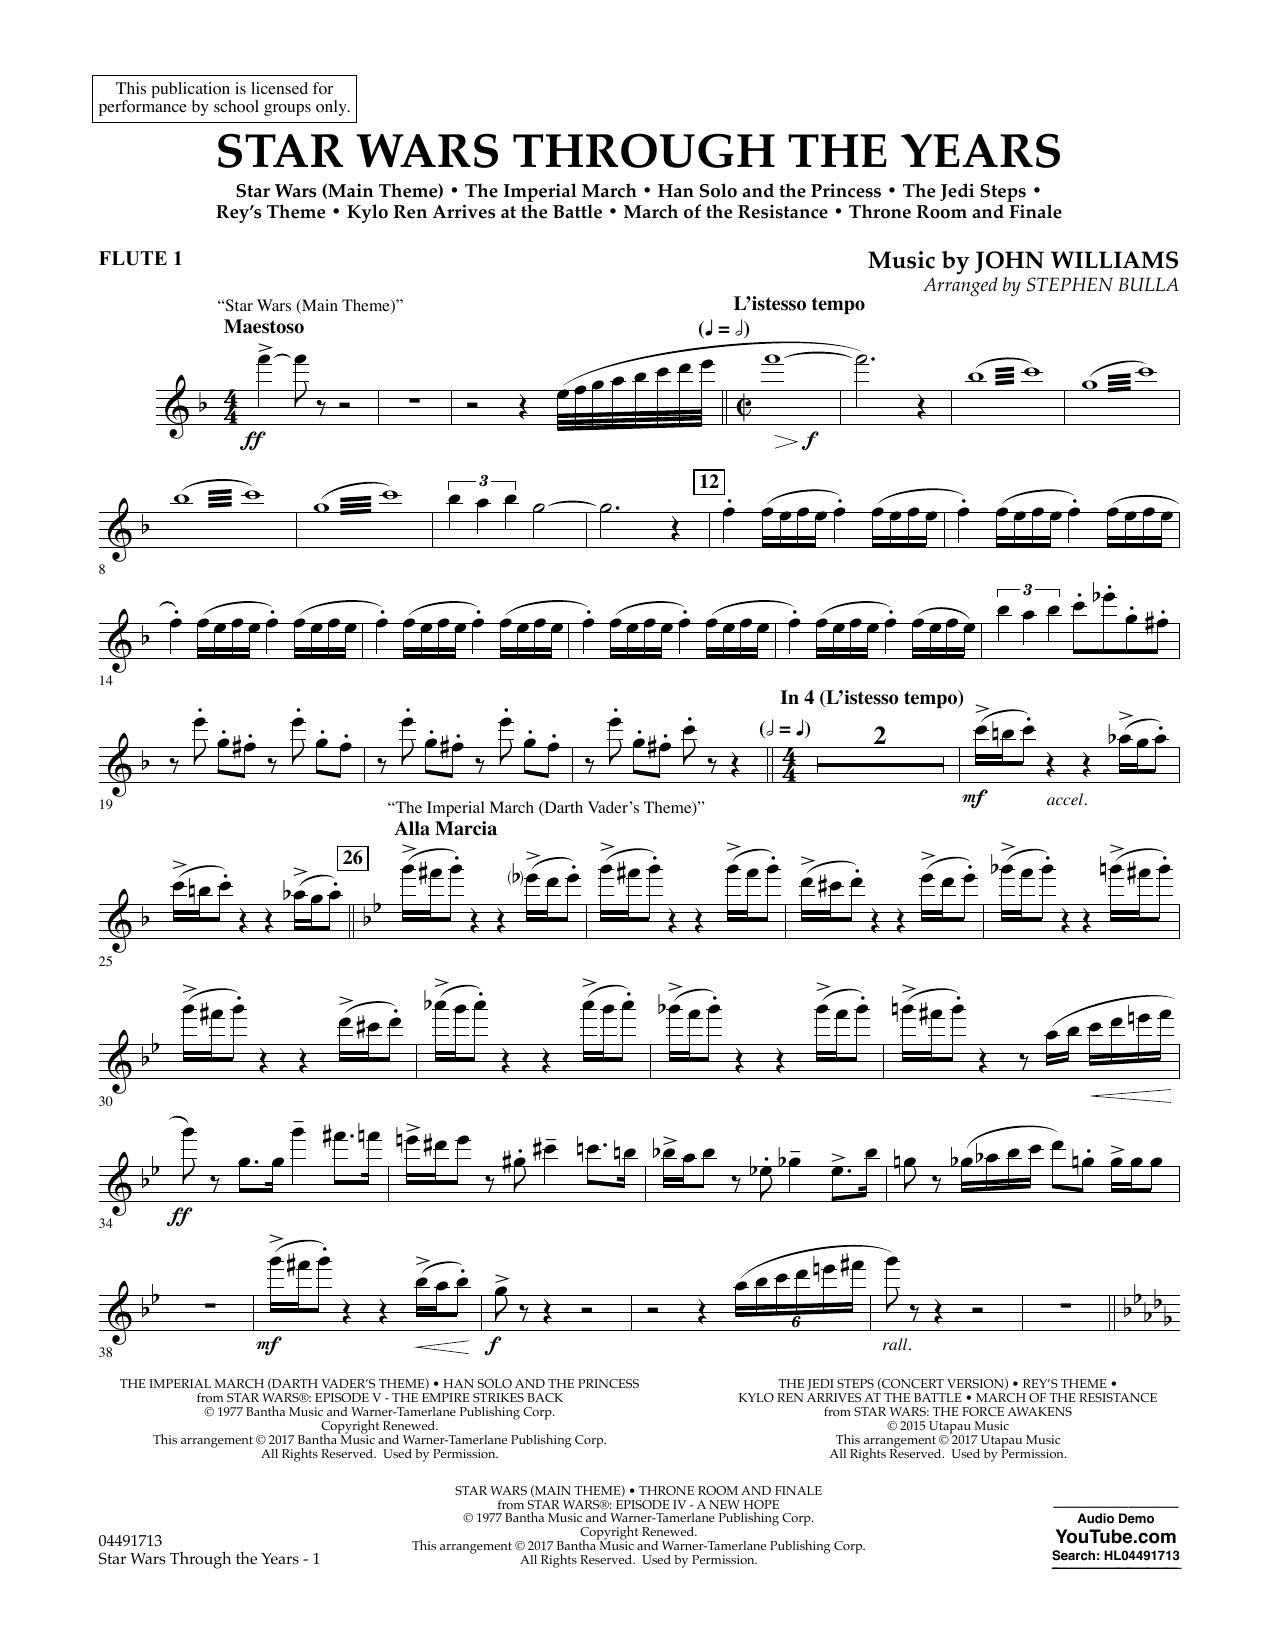 Star Wars Through the Years - Flute 1 Partituras Digitales